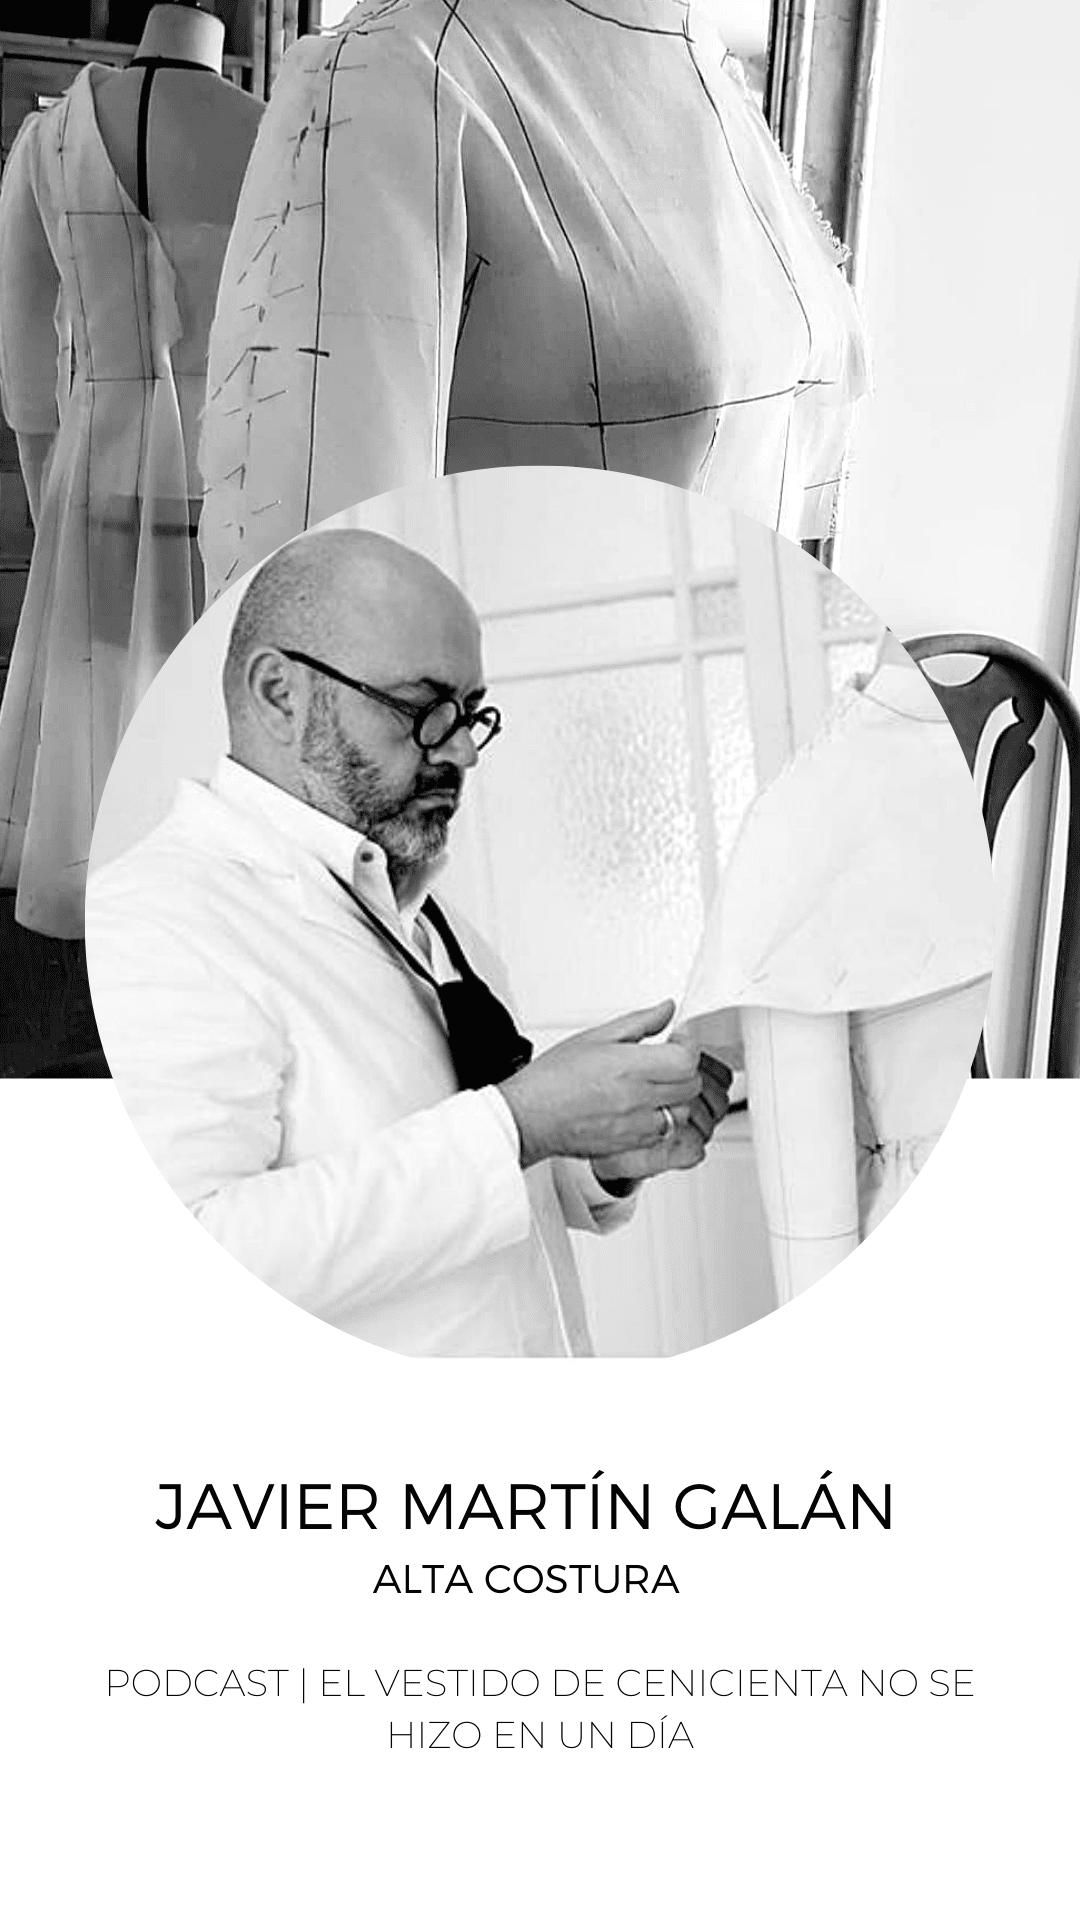 Javier_Martin_Galan_Podcast